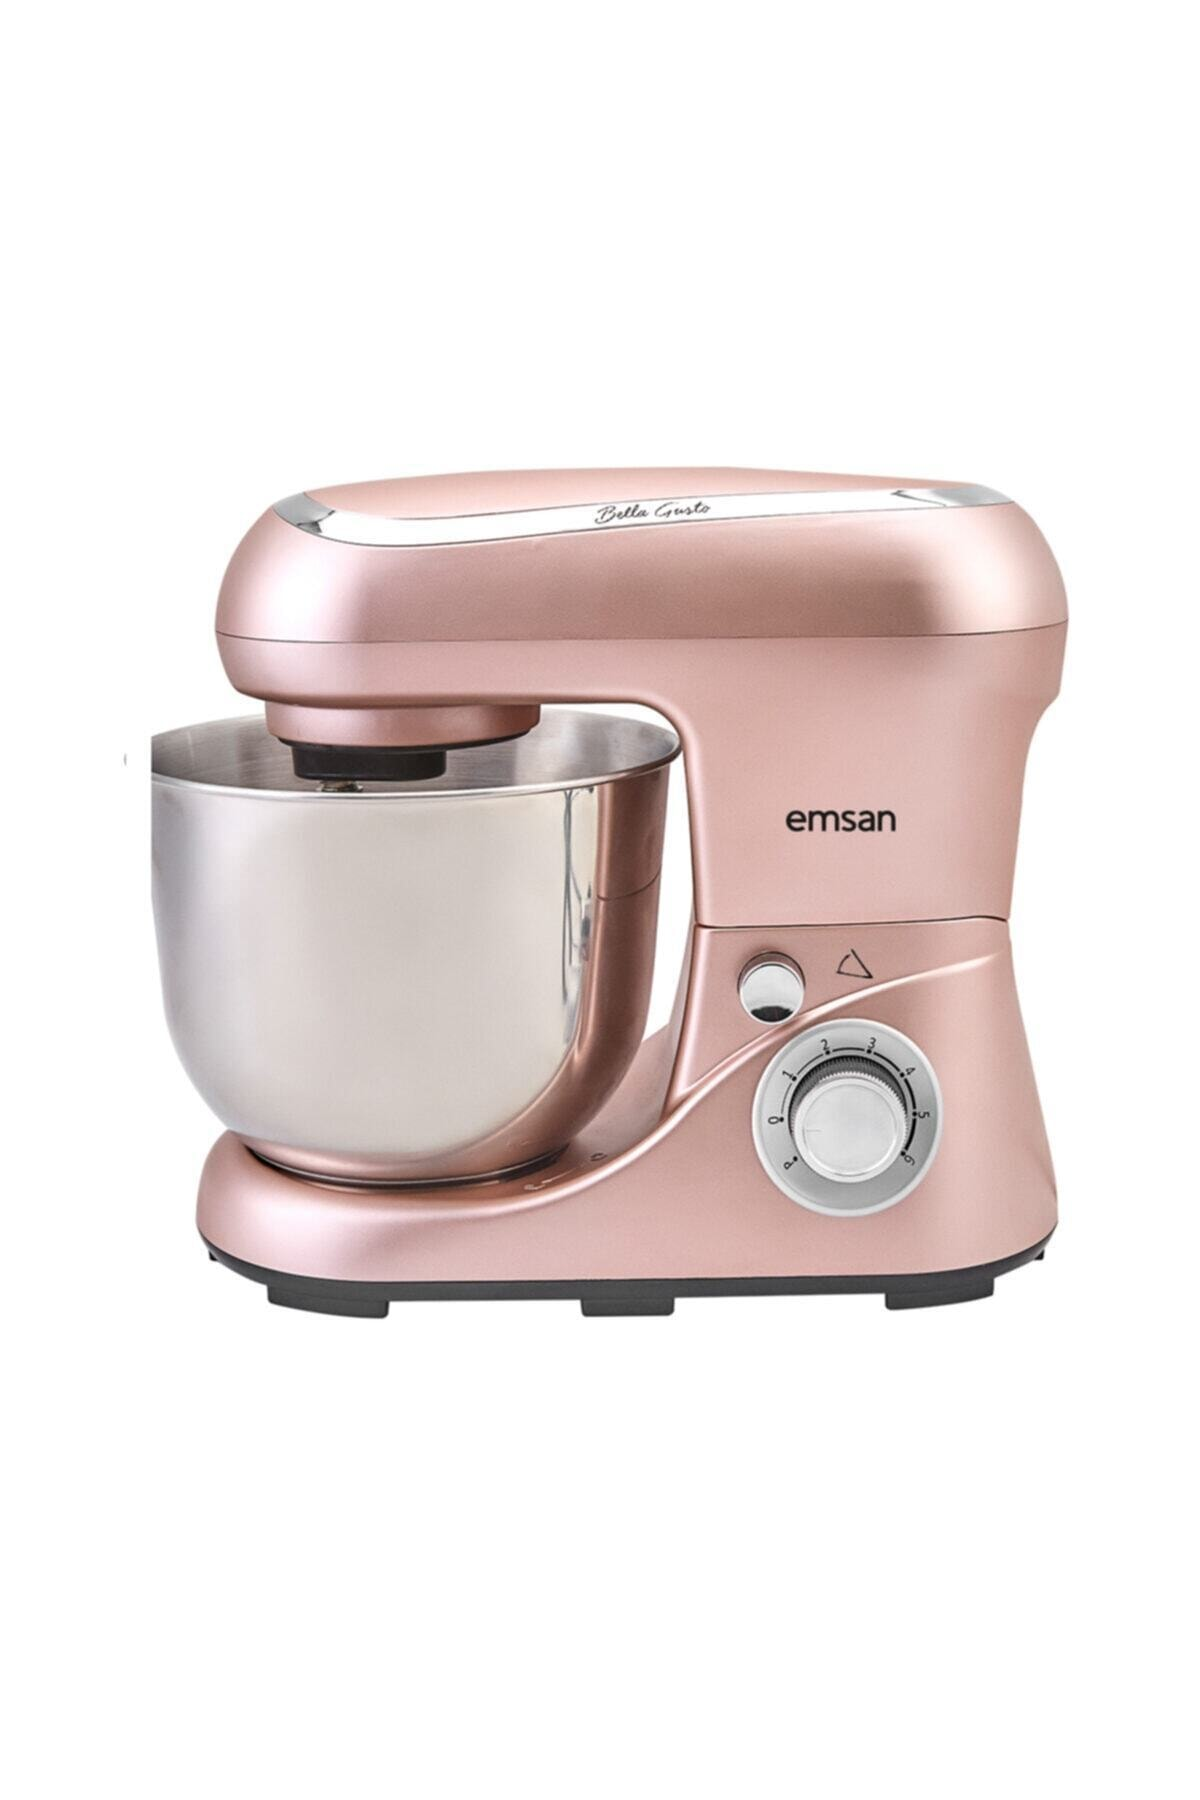 Emsan Bella Gusto Golden Pink Stand Mikser 1300W 1